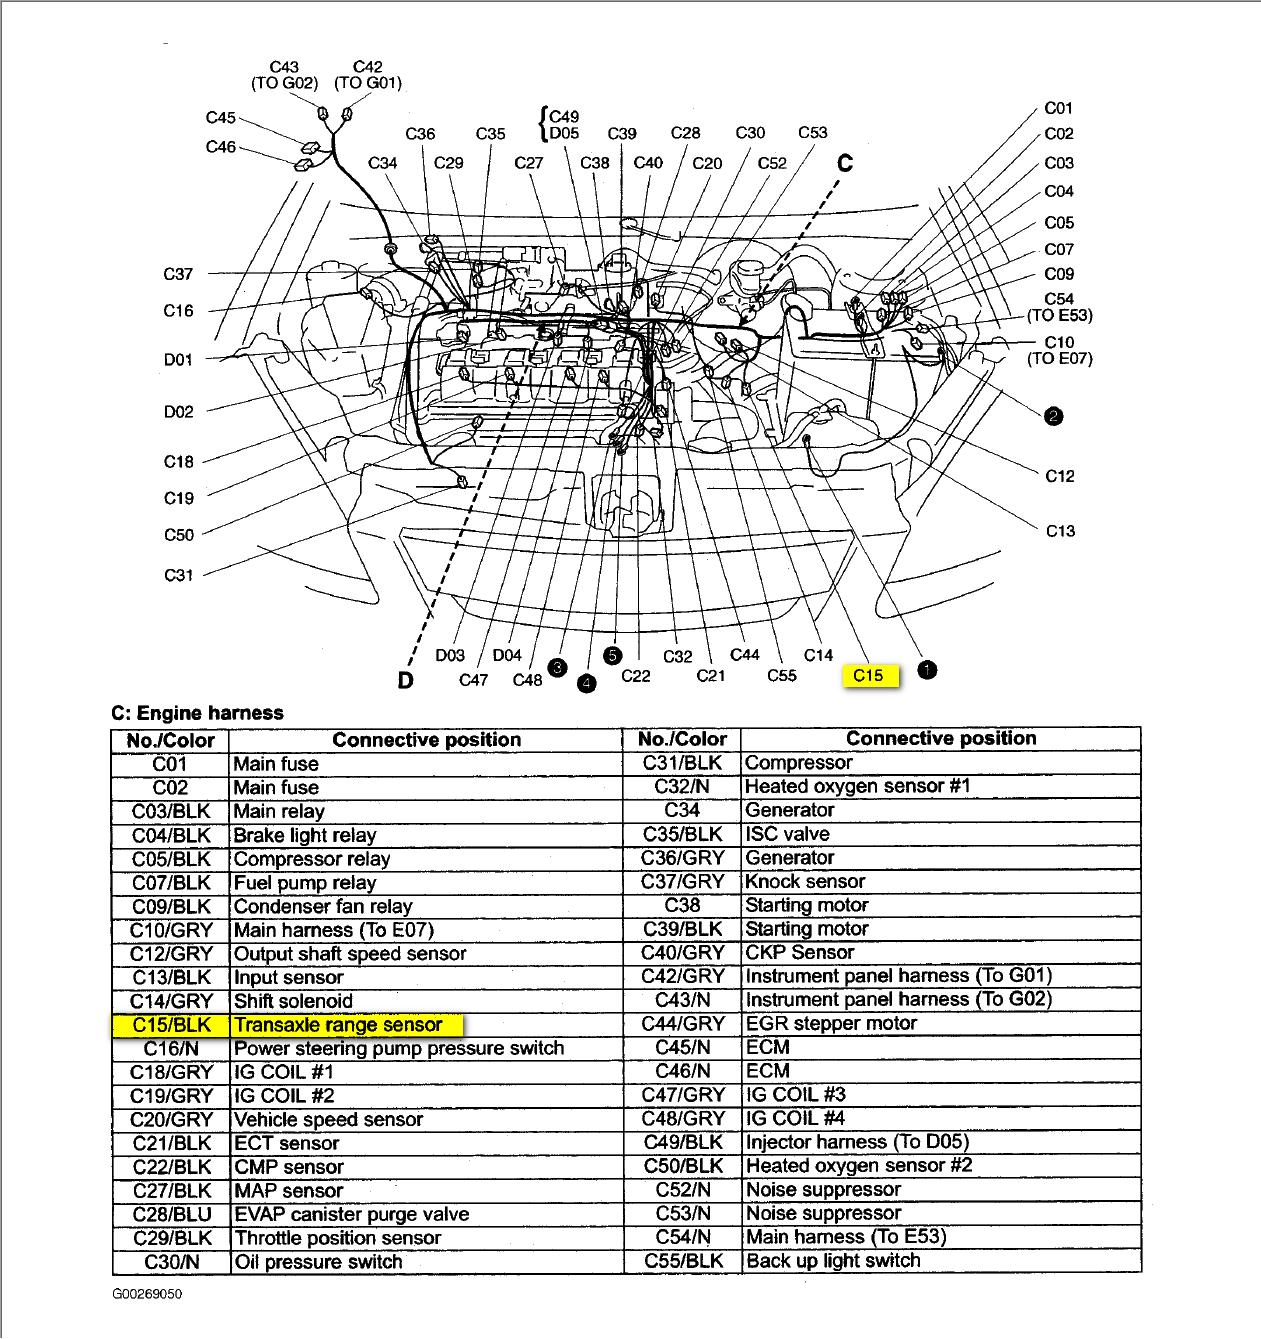 Wiring Diagram For 2002 Suzuki Aerio - Wiring Diagram Replace  bald-classroom - bald-classroom.miramontiseo.it | Wiring Diagram For 2002 Suzuki Aerio |  | bald-classroom.miramontiseo.it